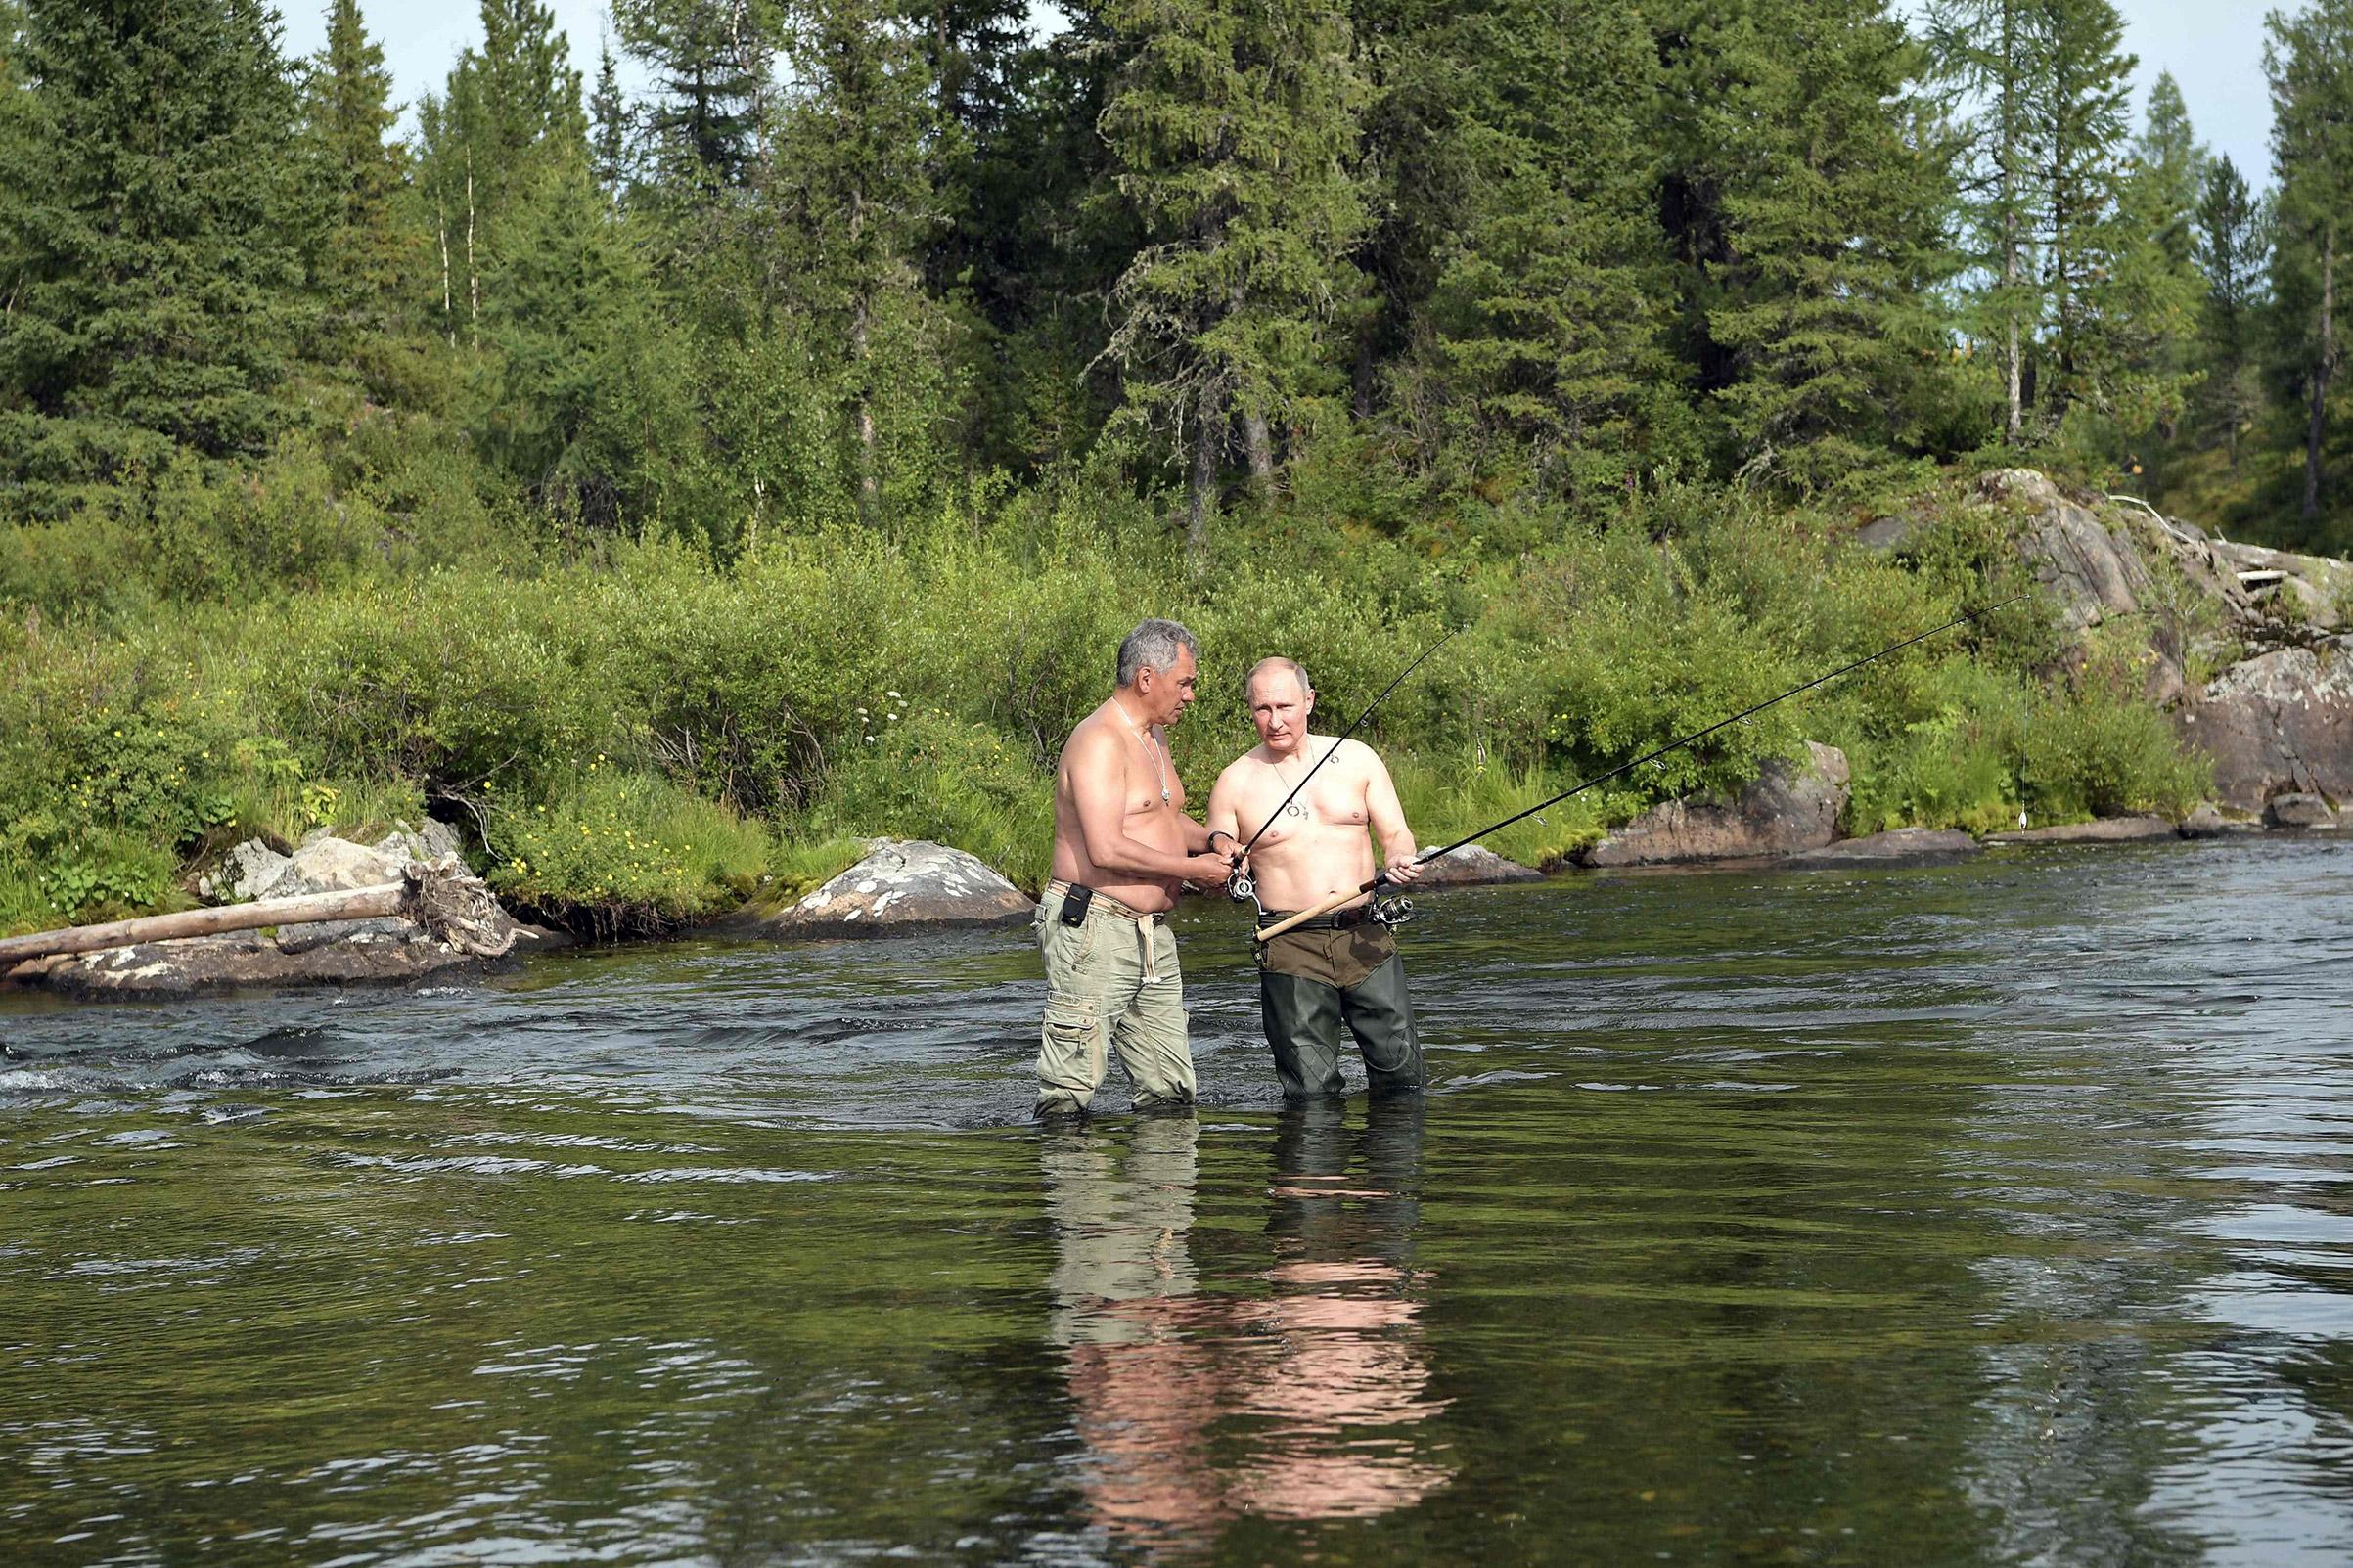 Photos Show Russian President Vladimir Putin On Vacation Time